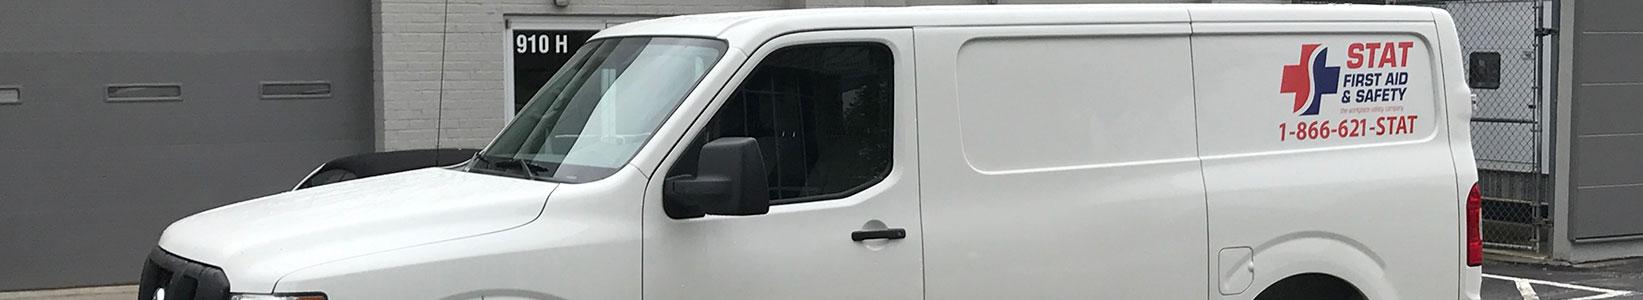 van delivery service